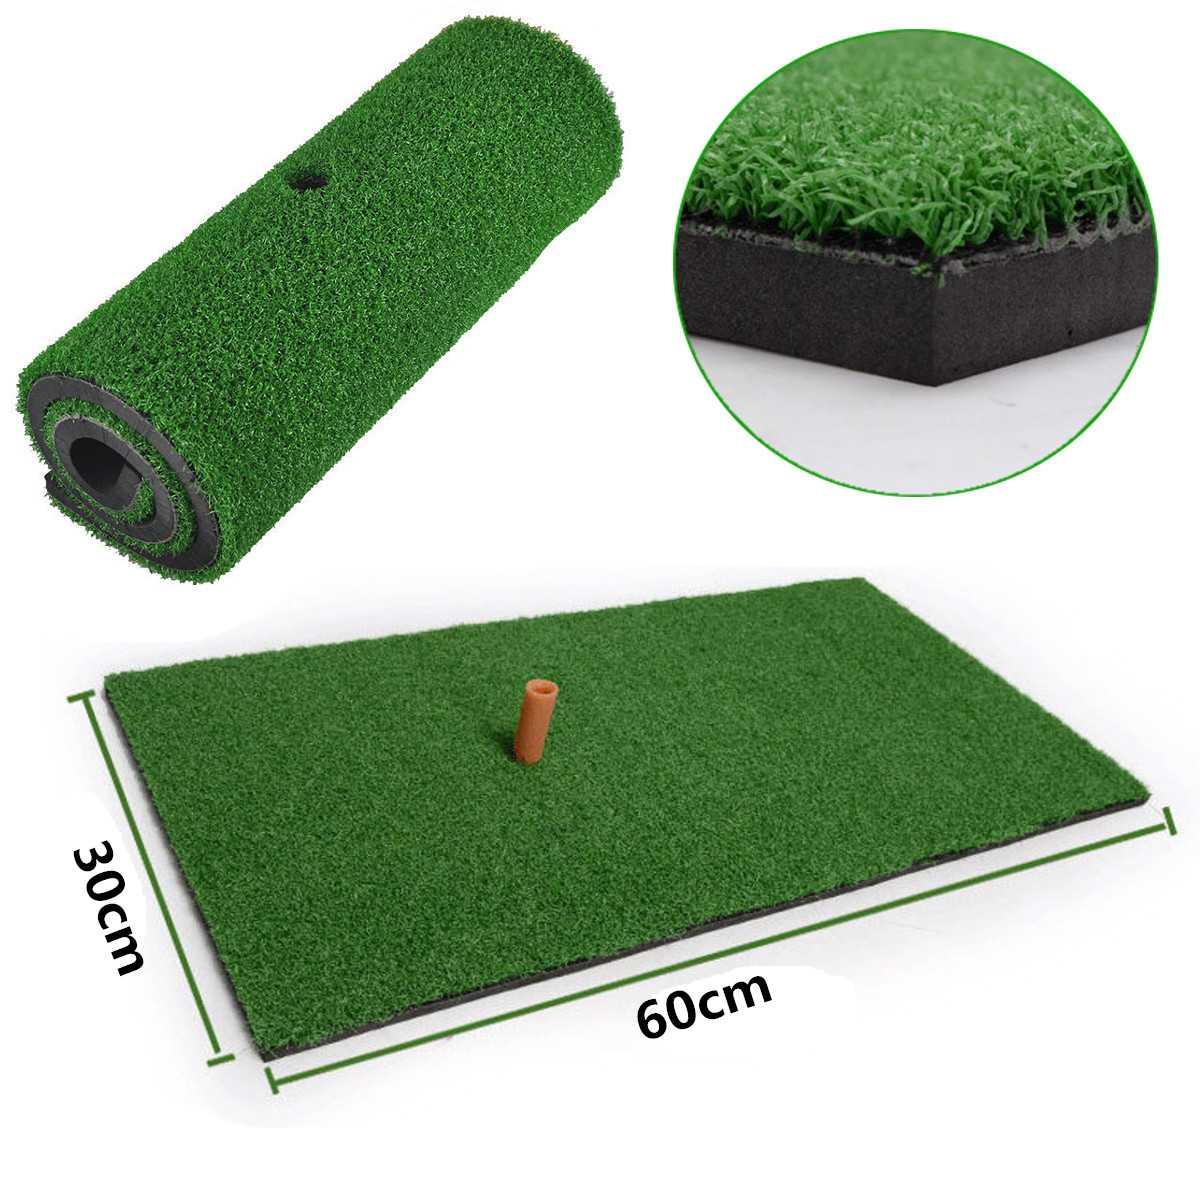 30X60cm Backyard Golf Practice Mat Indoor Training Hitting Grass Driving Holder